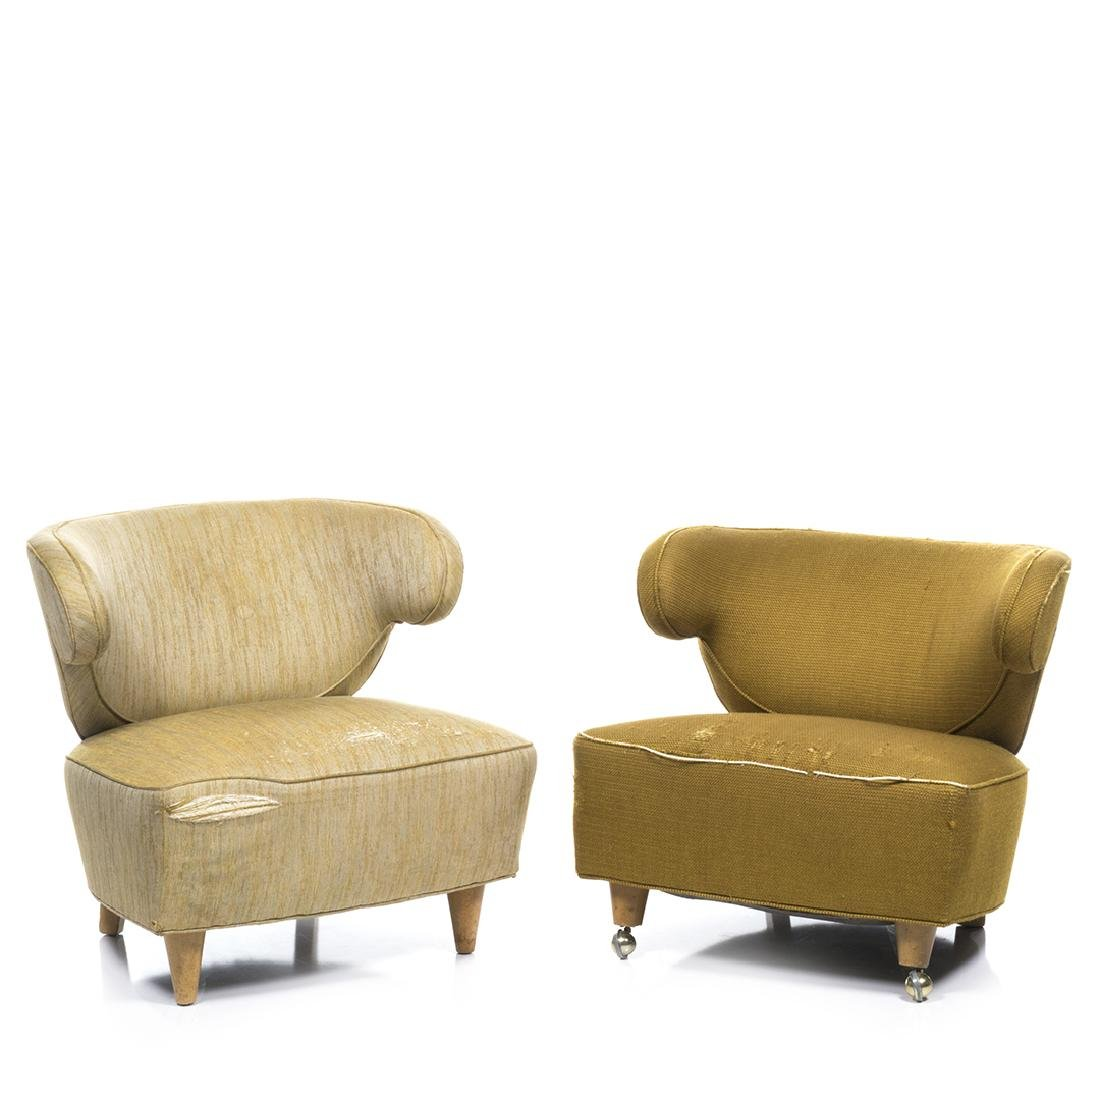 Paul Laszlo Scroll Arm Lounge Chairs (2)